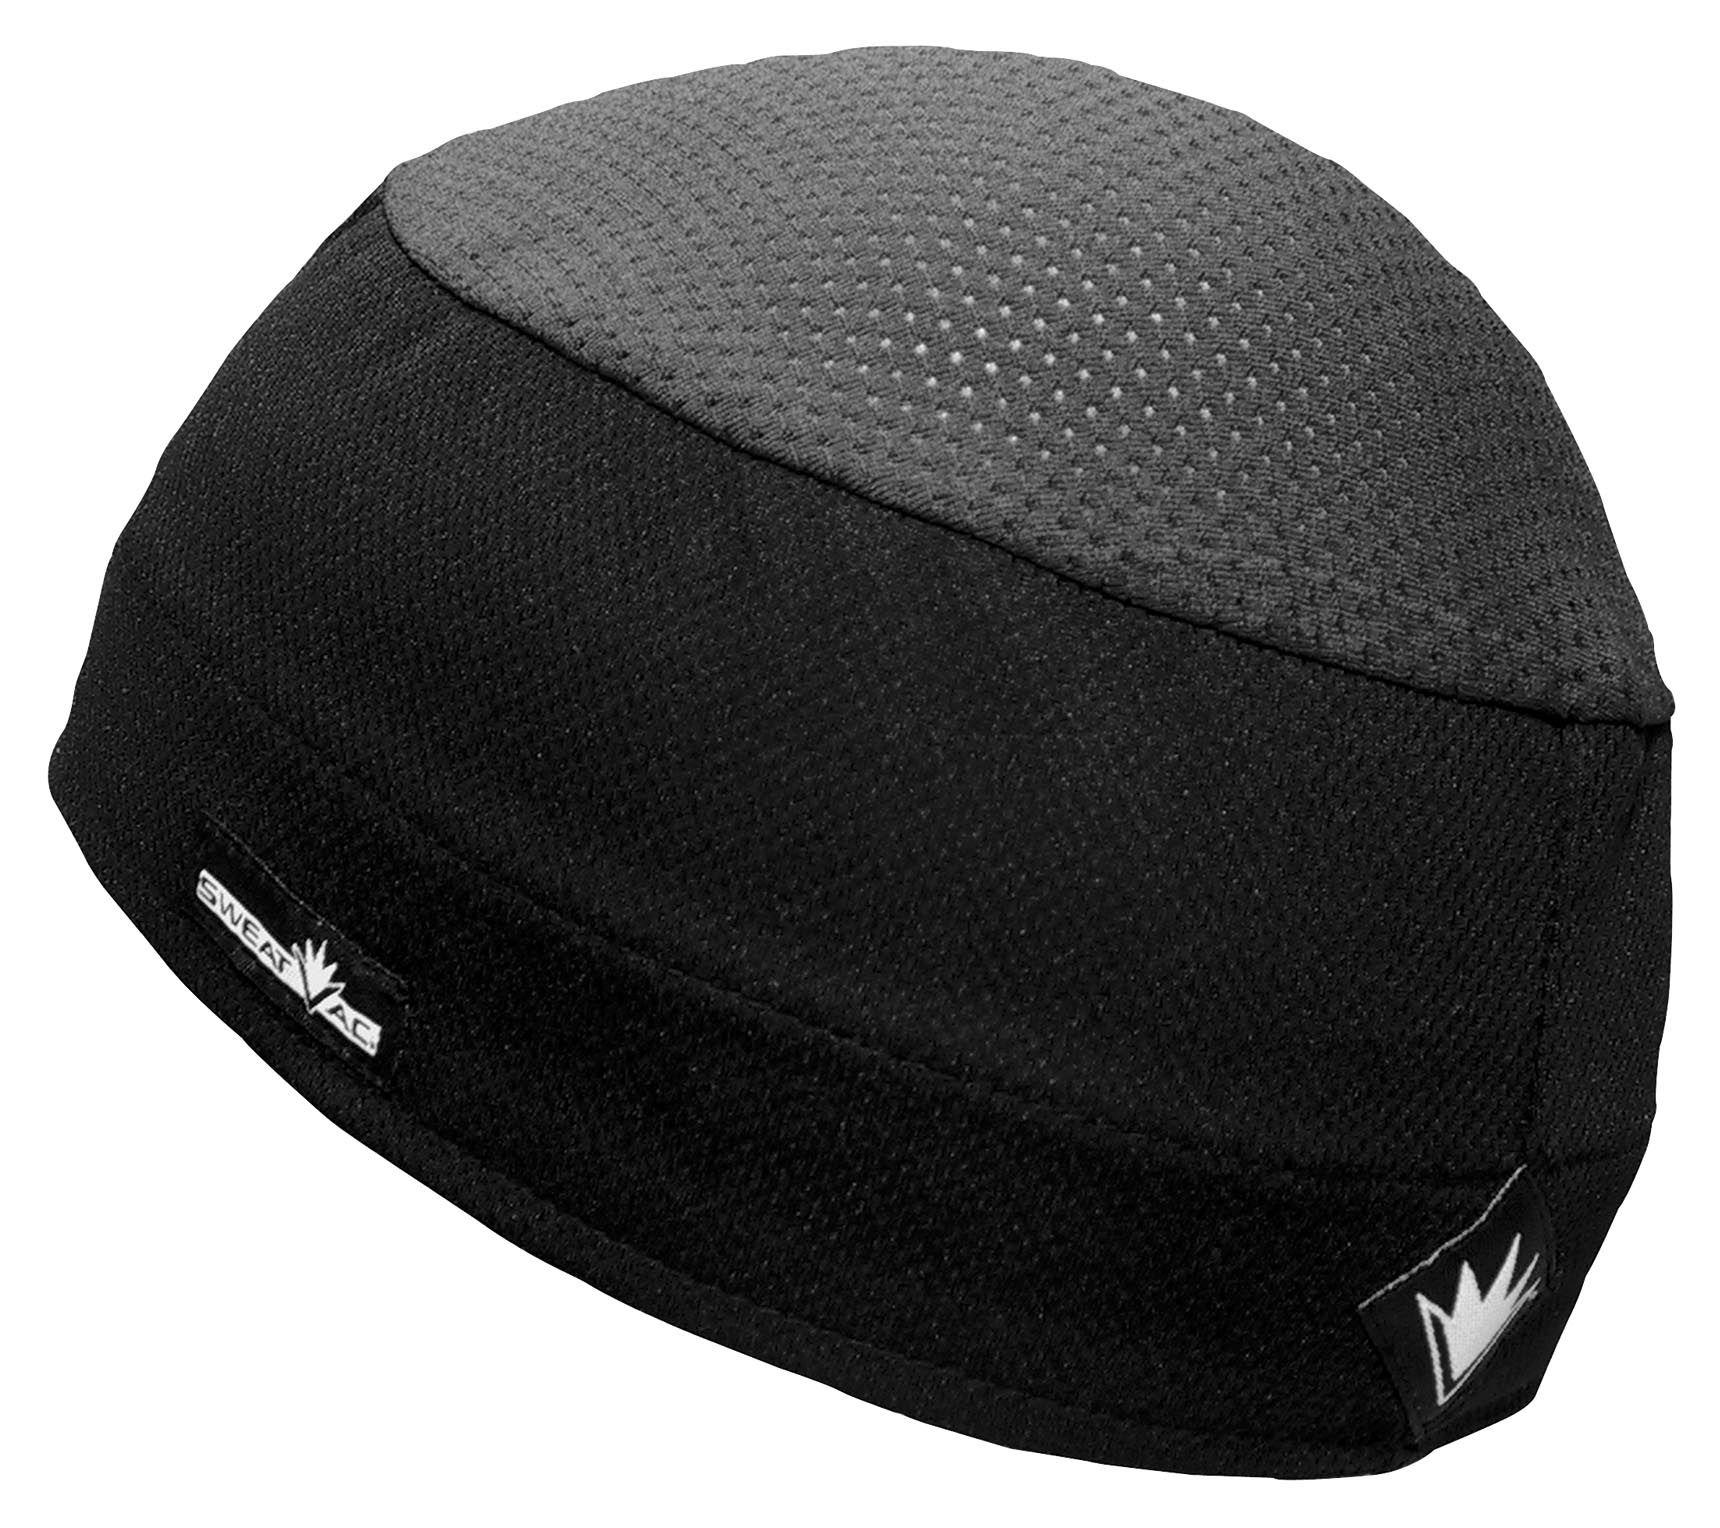 63222c18c6f Genuine Do Wraps Sweatvac Ventilator Cap - RevZilla